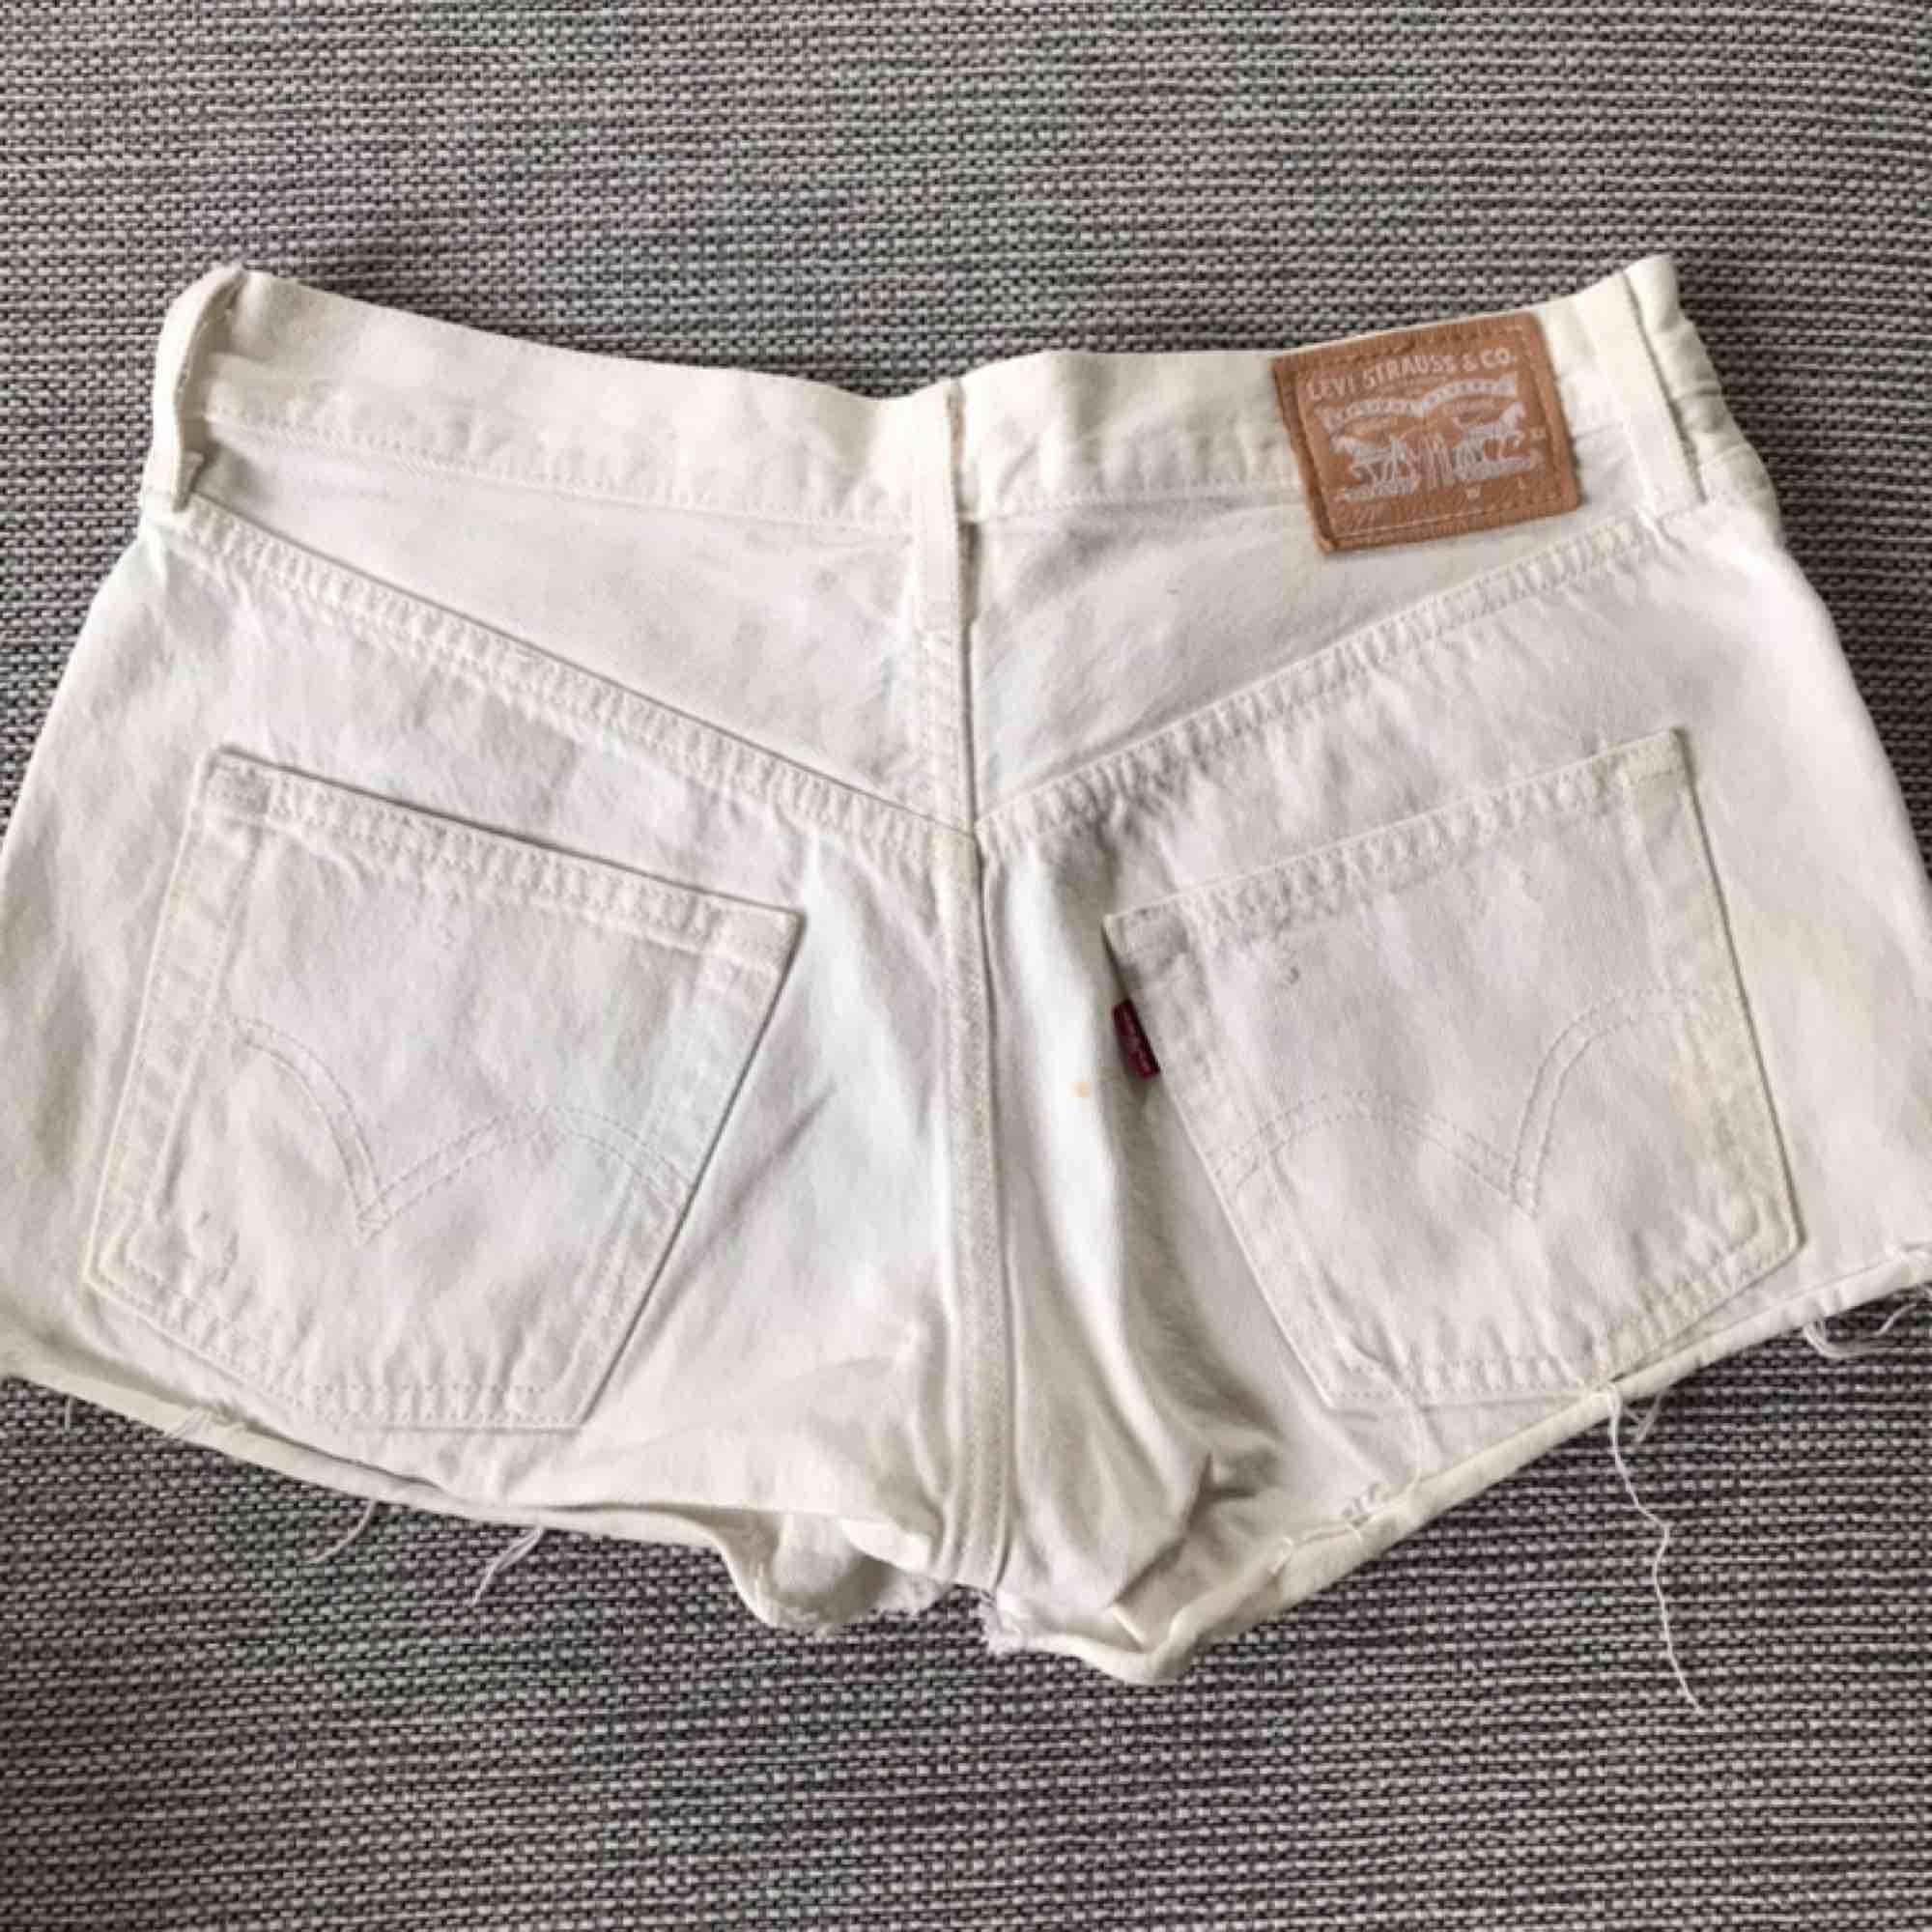 Vita levi's shorts. Shorts.